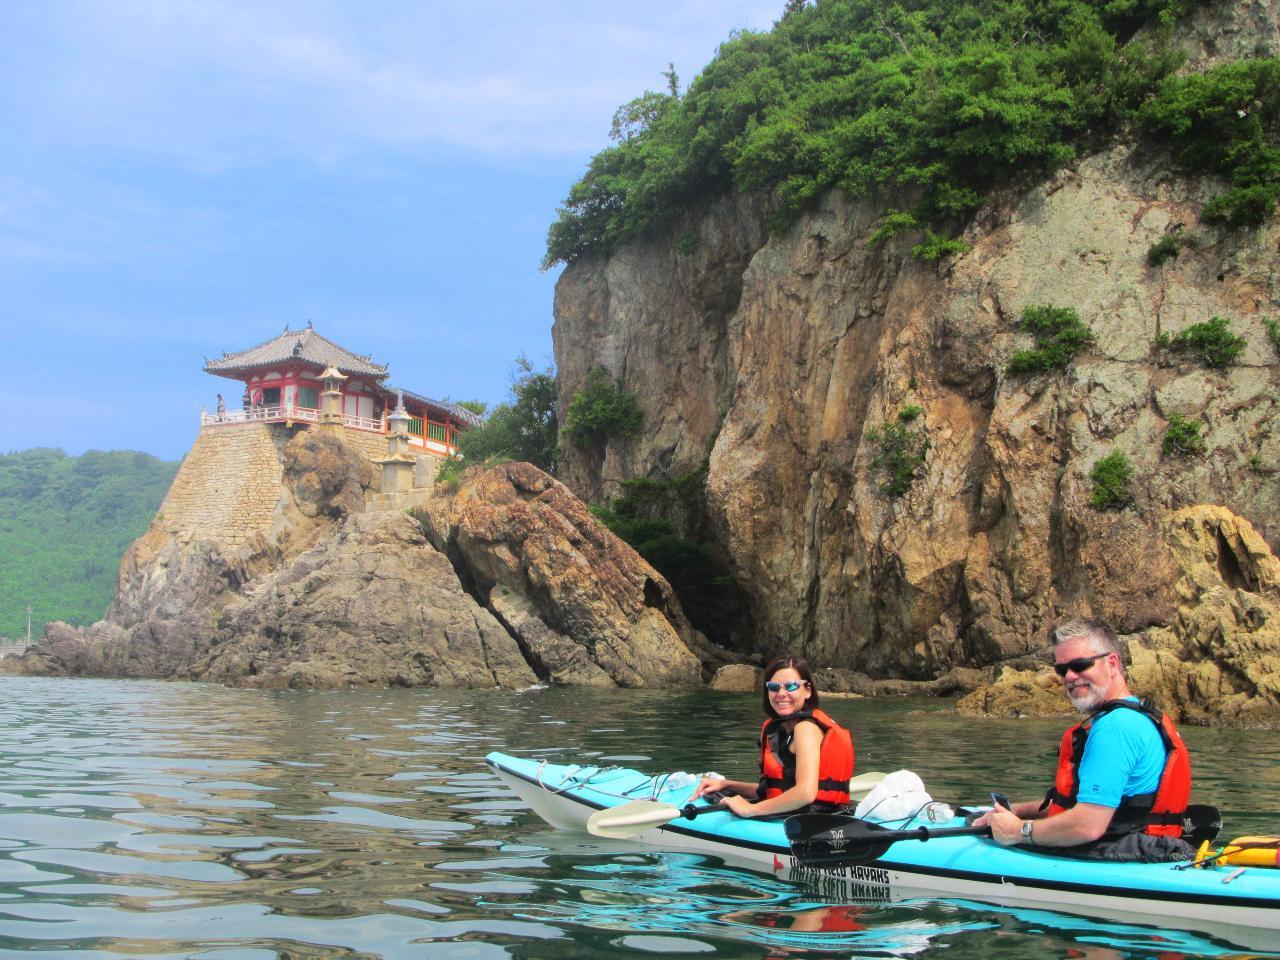 【Kayaker's Cafe】일본 제일의 경승지・도모노우라에서만 즐길 수 있는 바다 카약 투어 (1일) /ジブリやハリウッドの舞台となった海でシーカヤックツアー(1日)